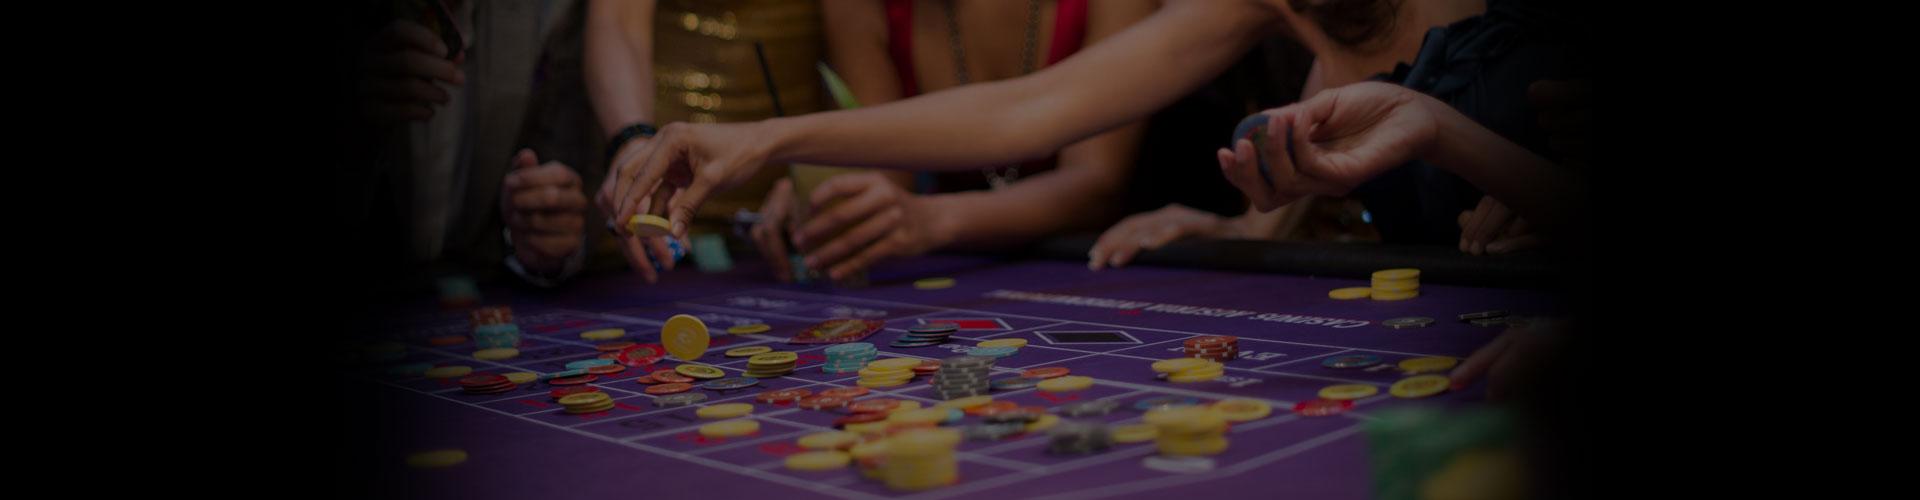 casumo casino betrug